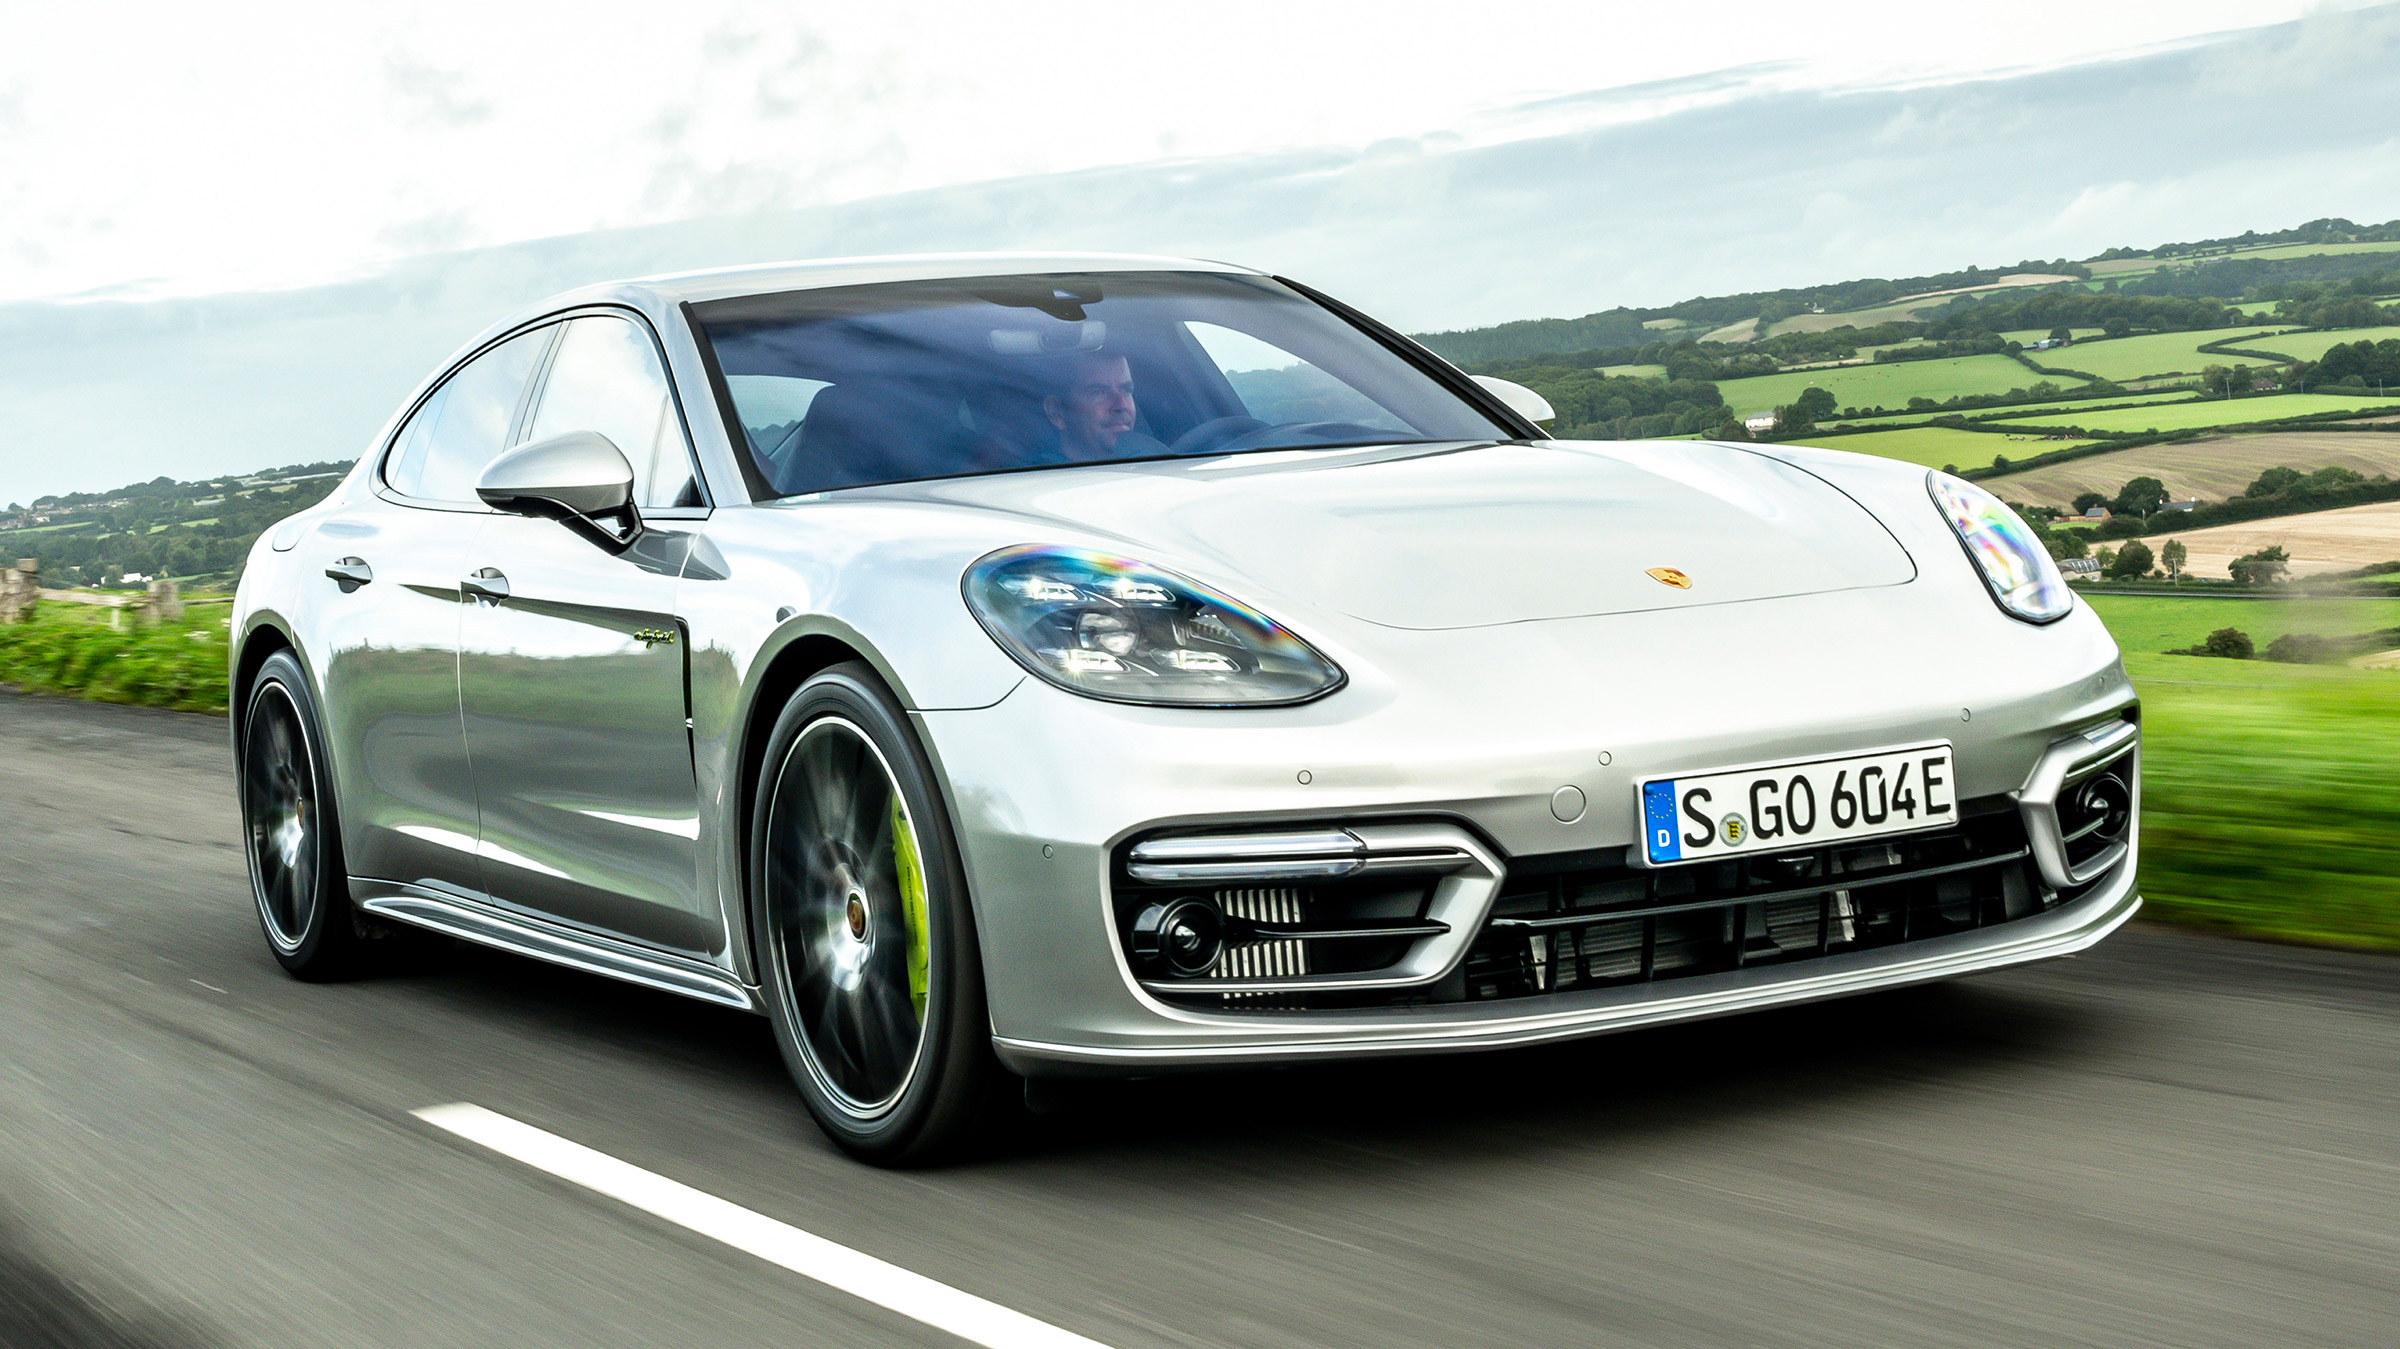 Porsche Panamera hatchback 2020 review | Carbuyer